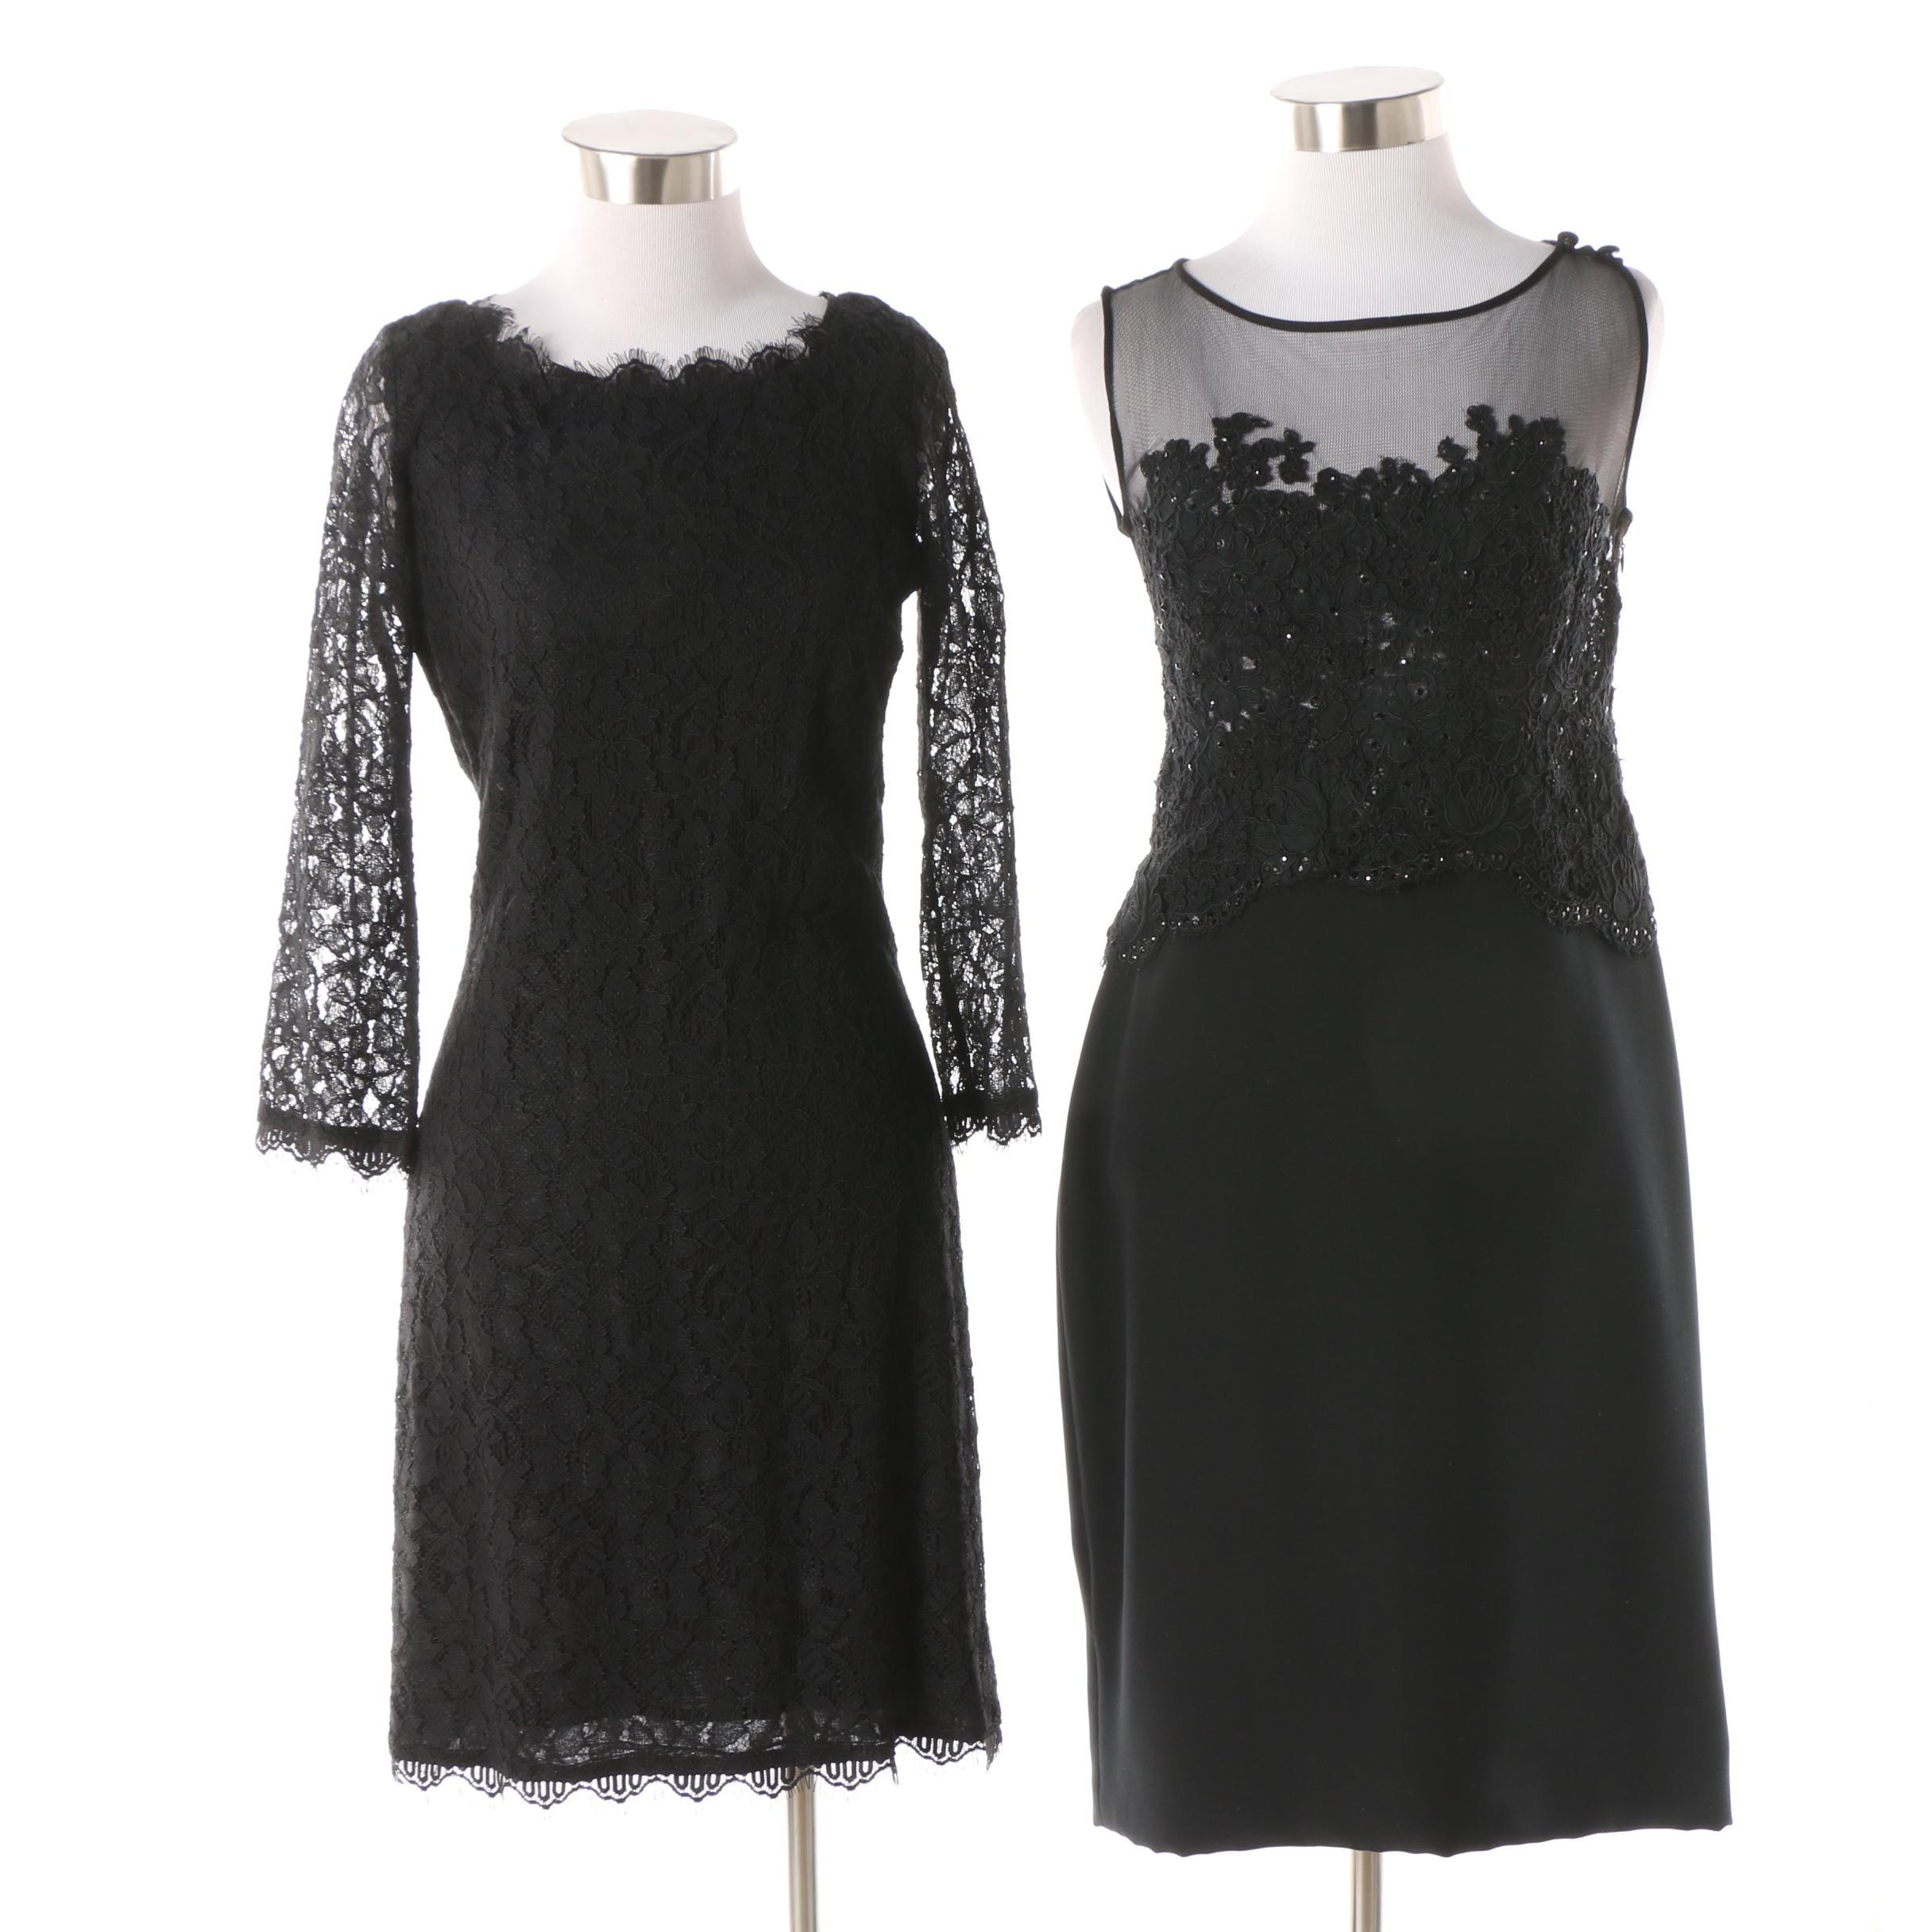 Diane von Furstenberg Black Zarita Dress and Yoly Muñoz Illusion Yoke Dress